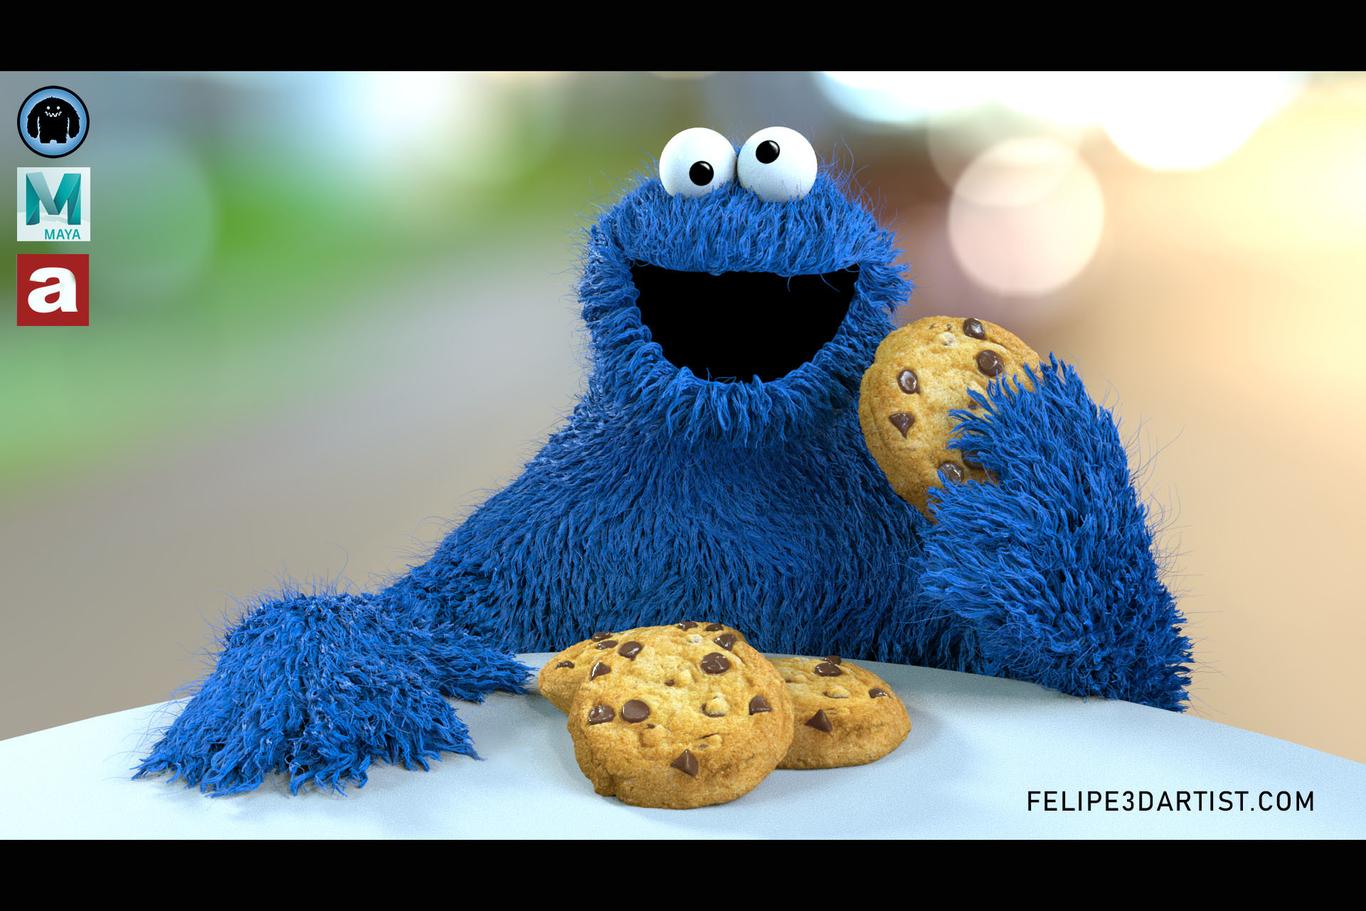 Felipe3dartist cookie monster 1 52ad6fd9 zusq